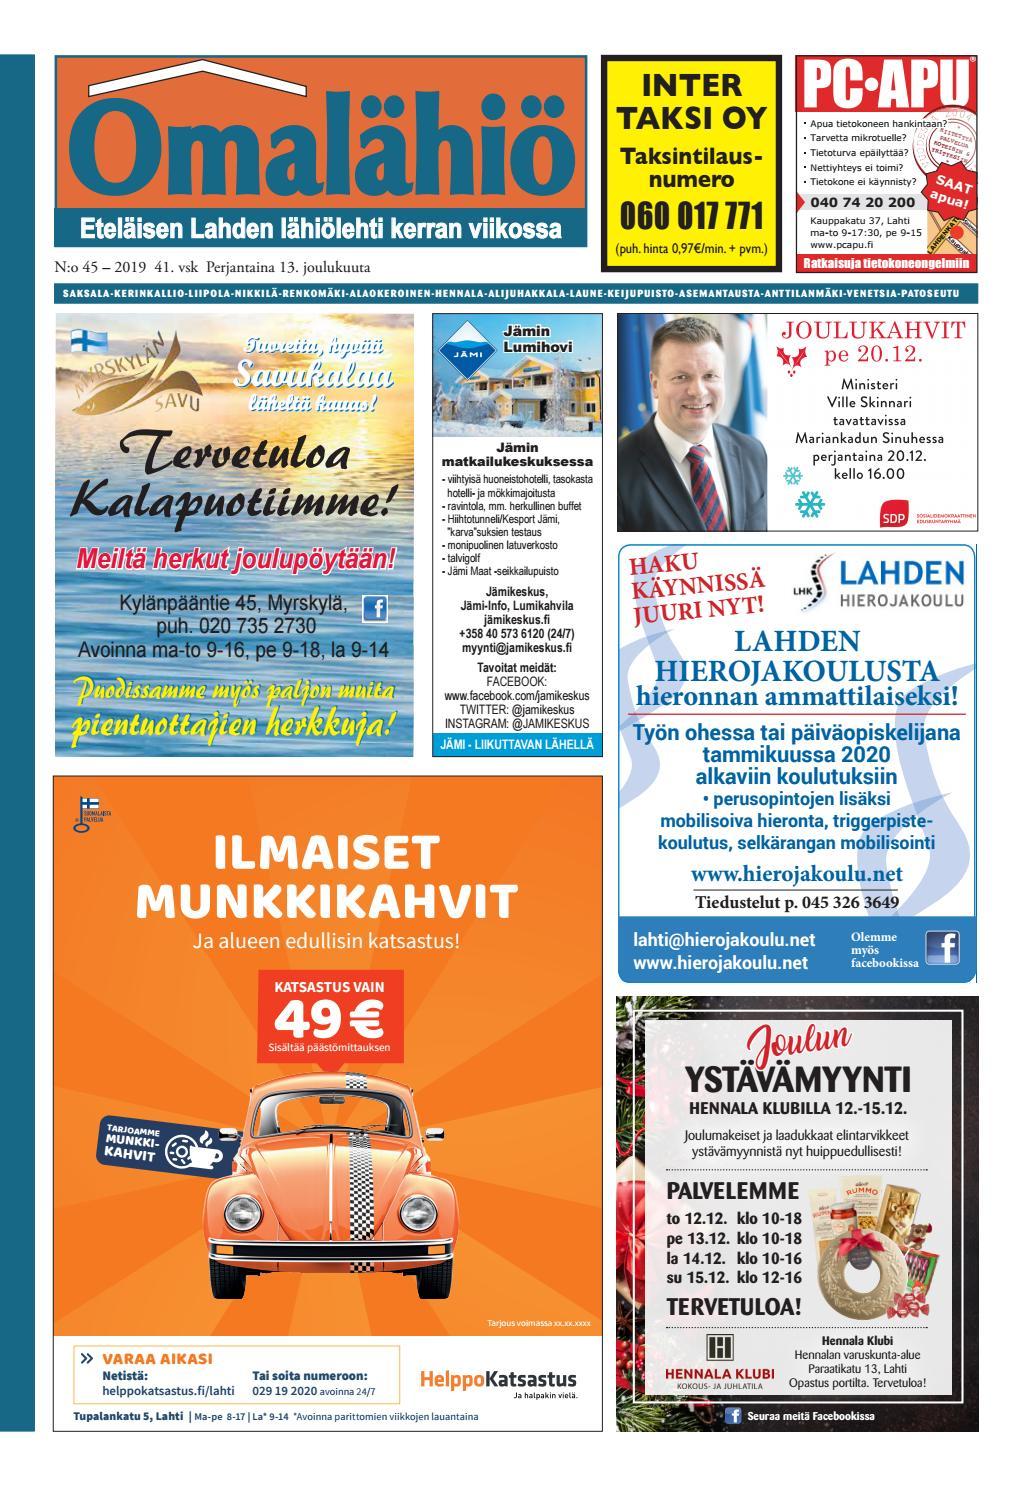 Thai Massage Espoo Seksiä Tampere